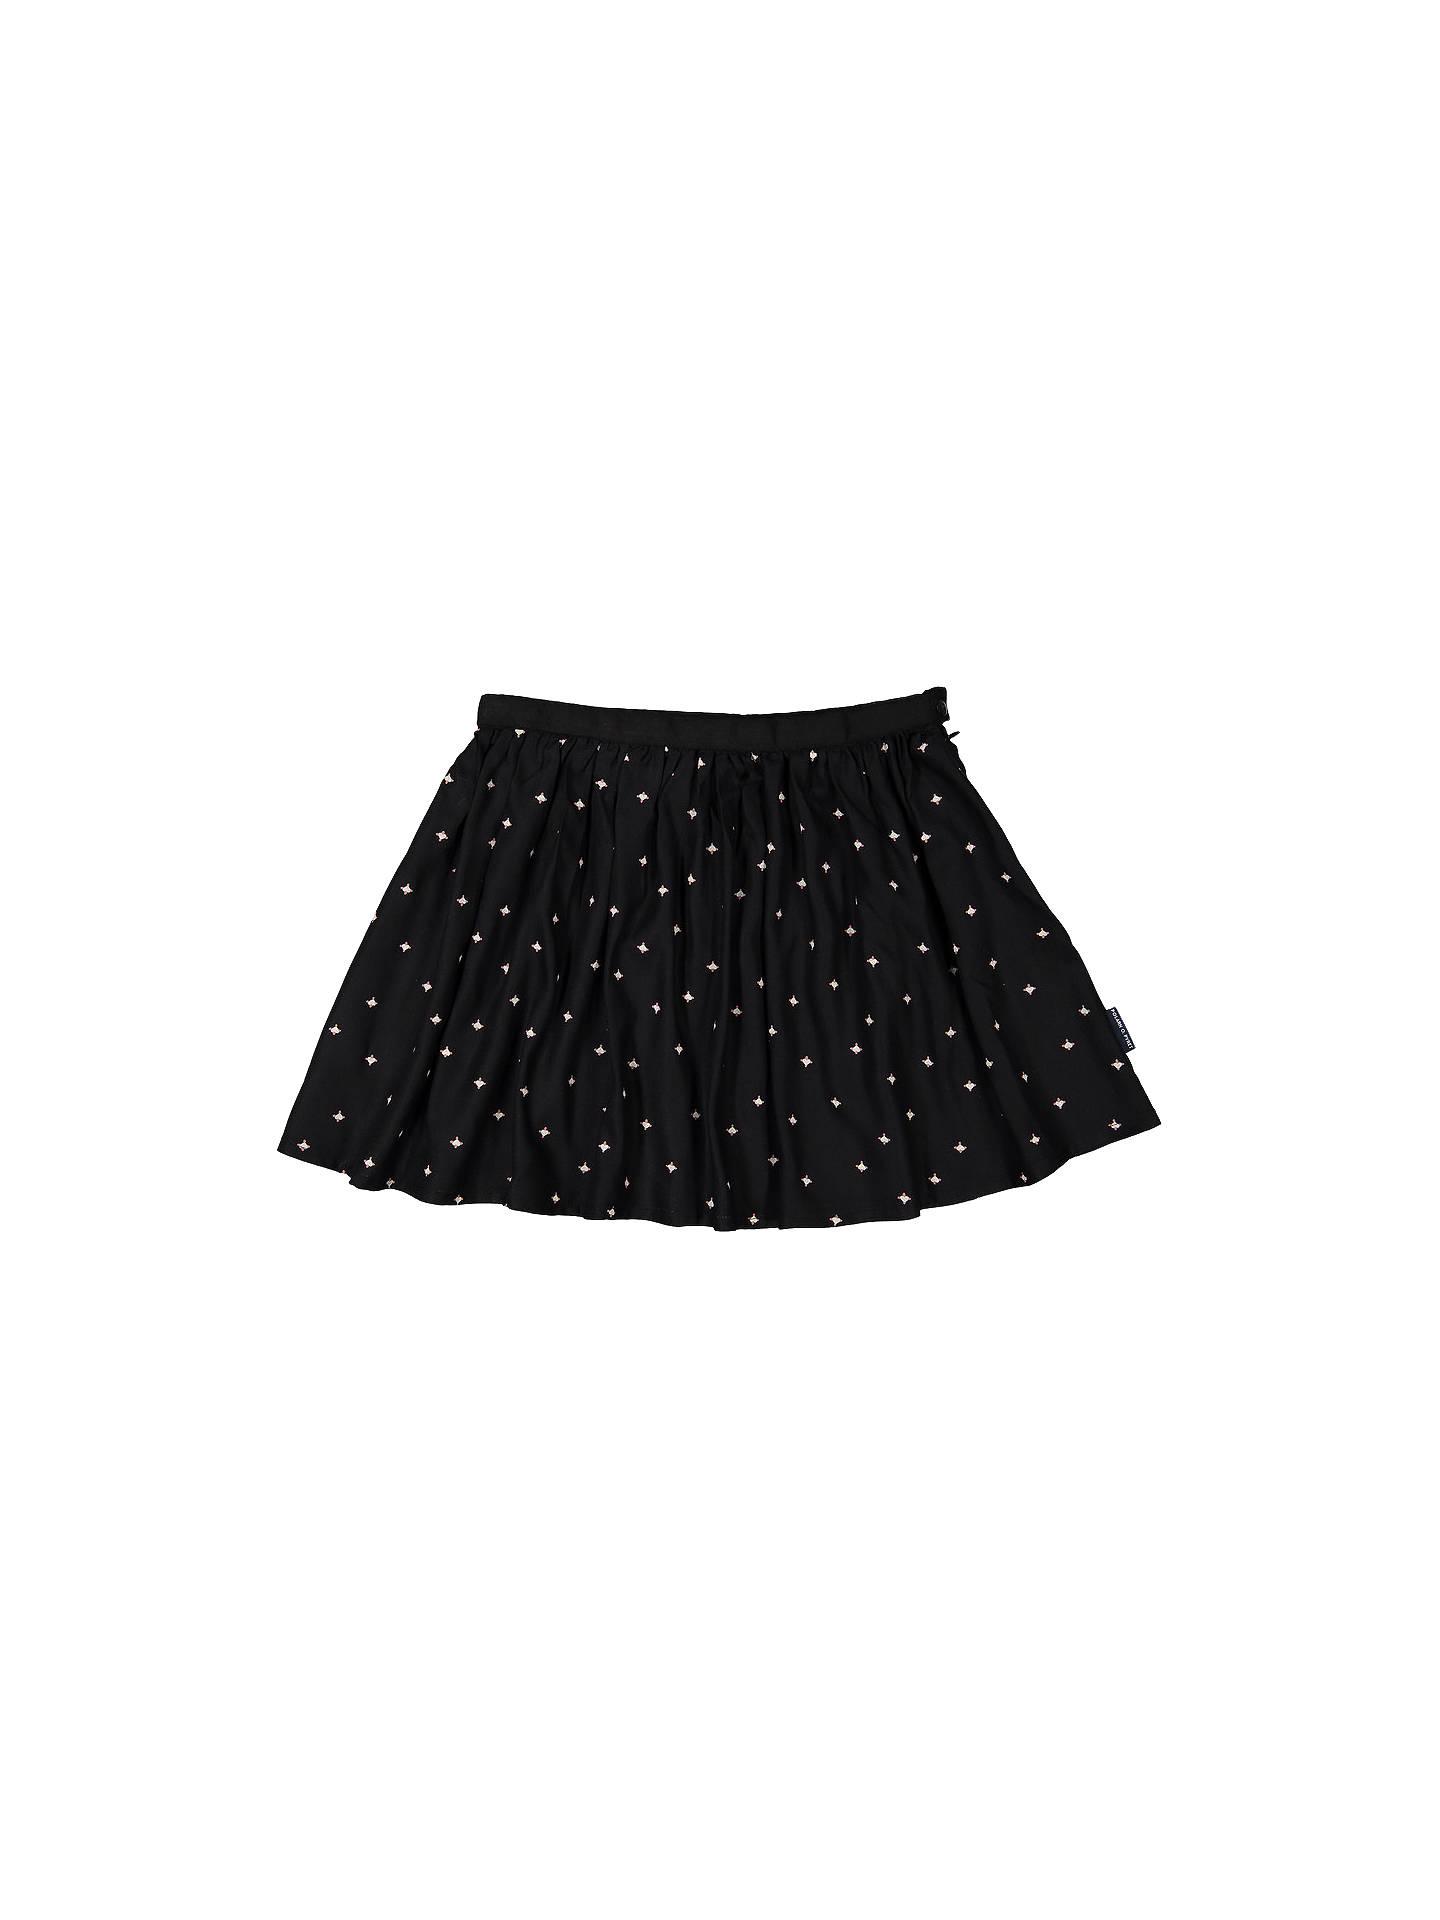 79ad0cf774 Polarn O. Pyret Girls' Star Skirt, Blue at John Lewis & Partners